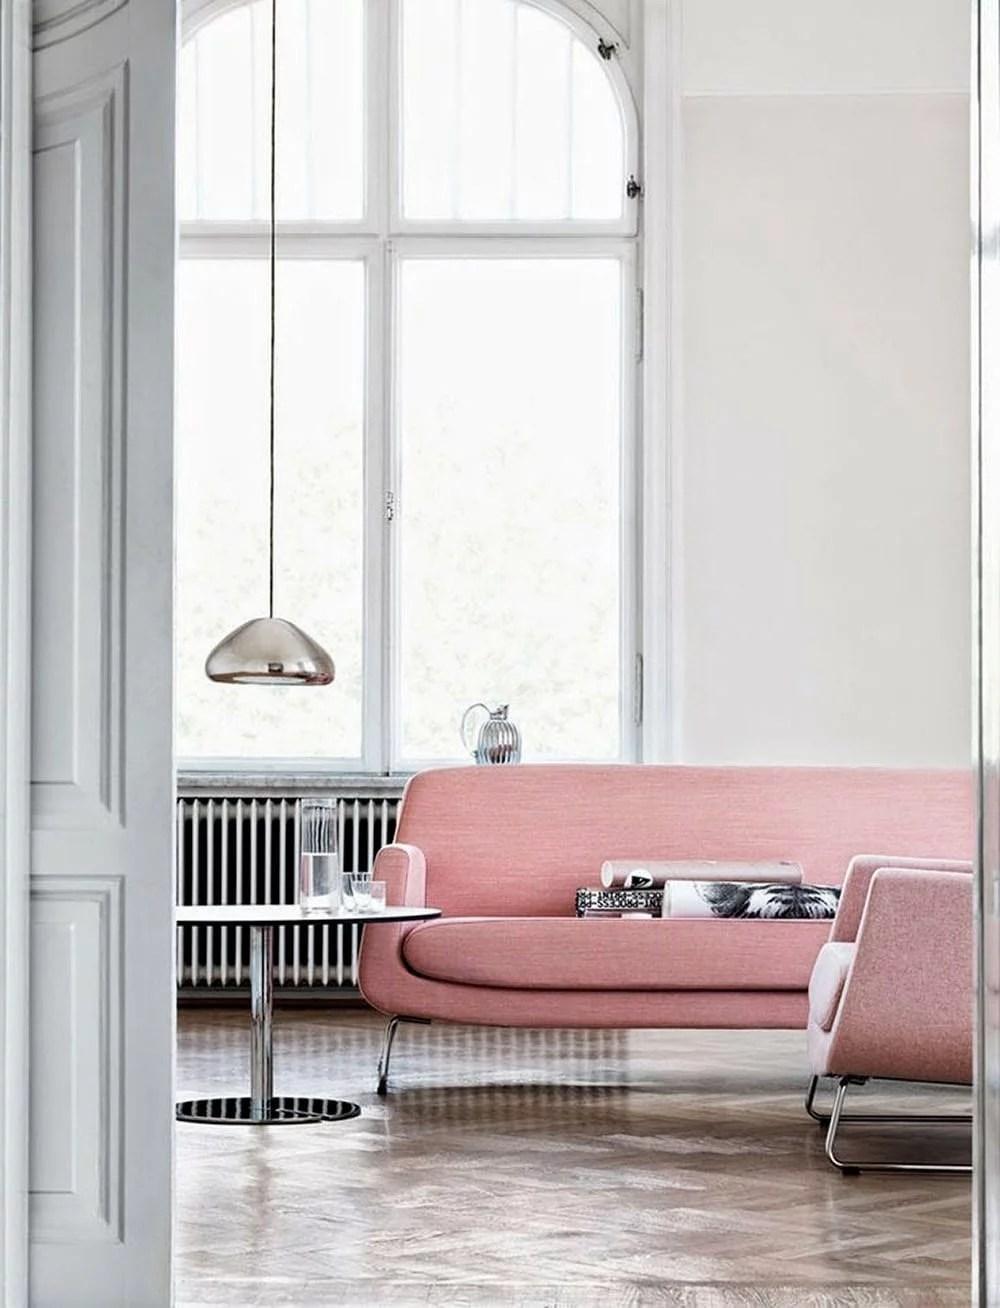 Decorating With Dusty Pink  StyleMinimalism